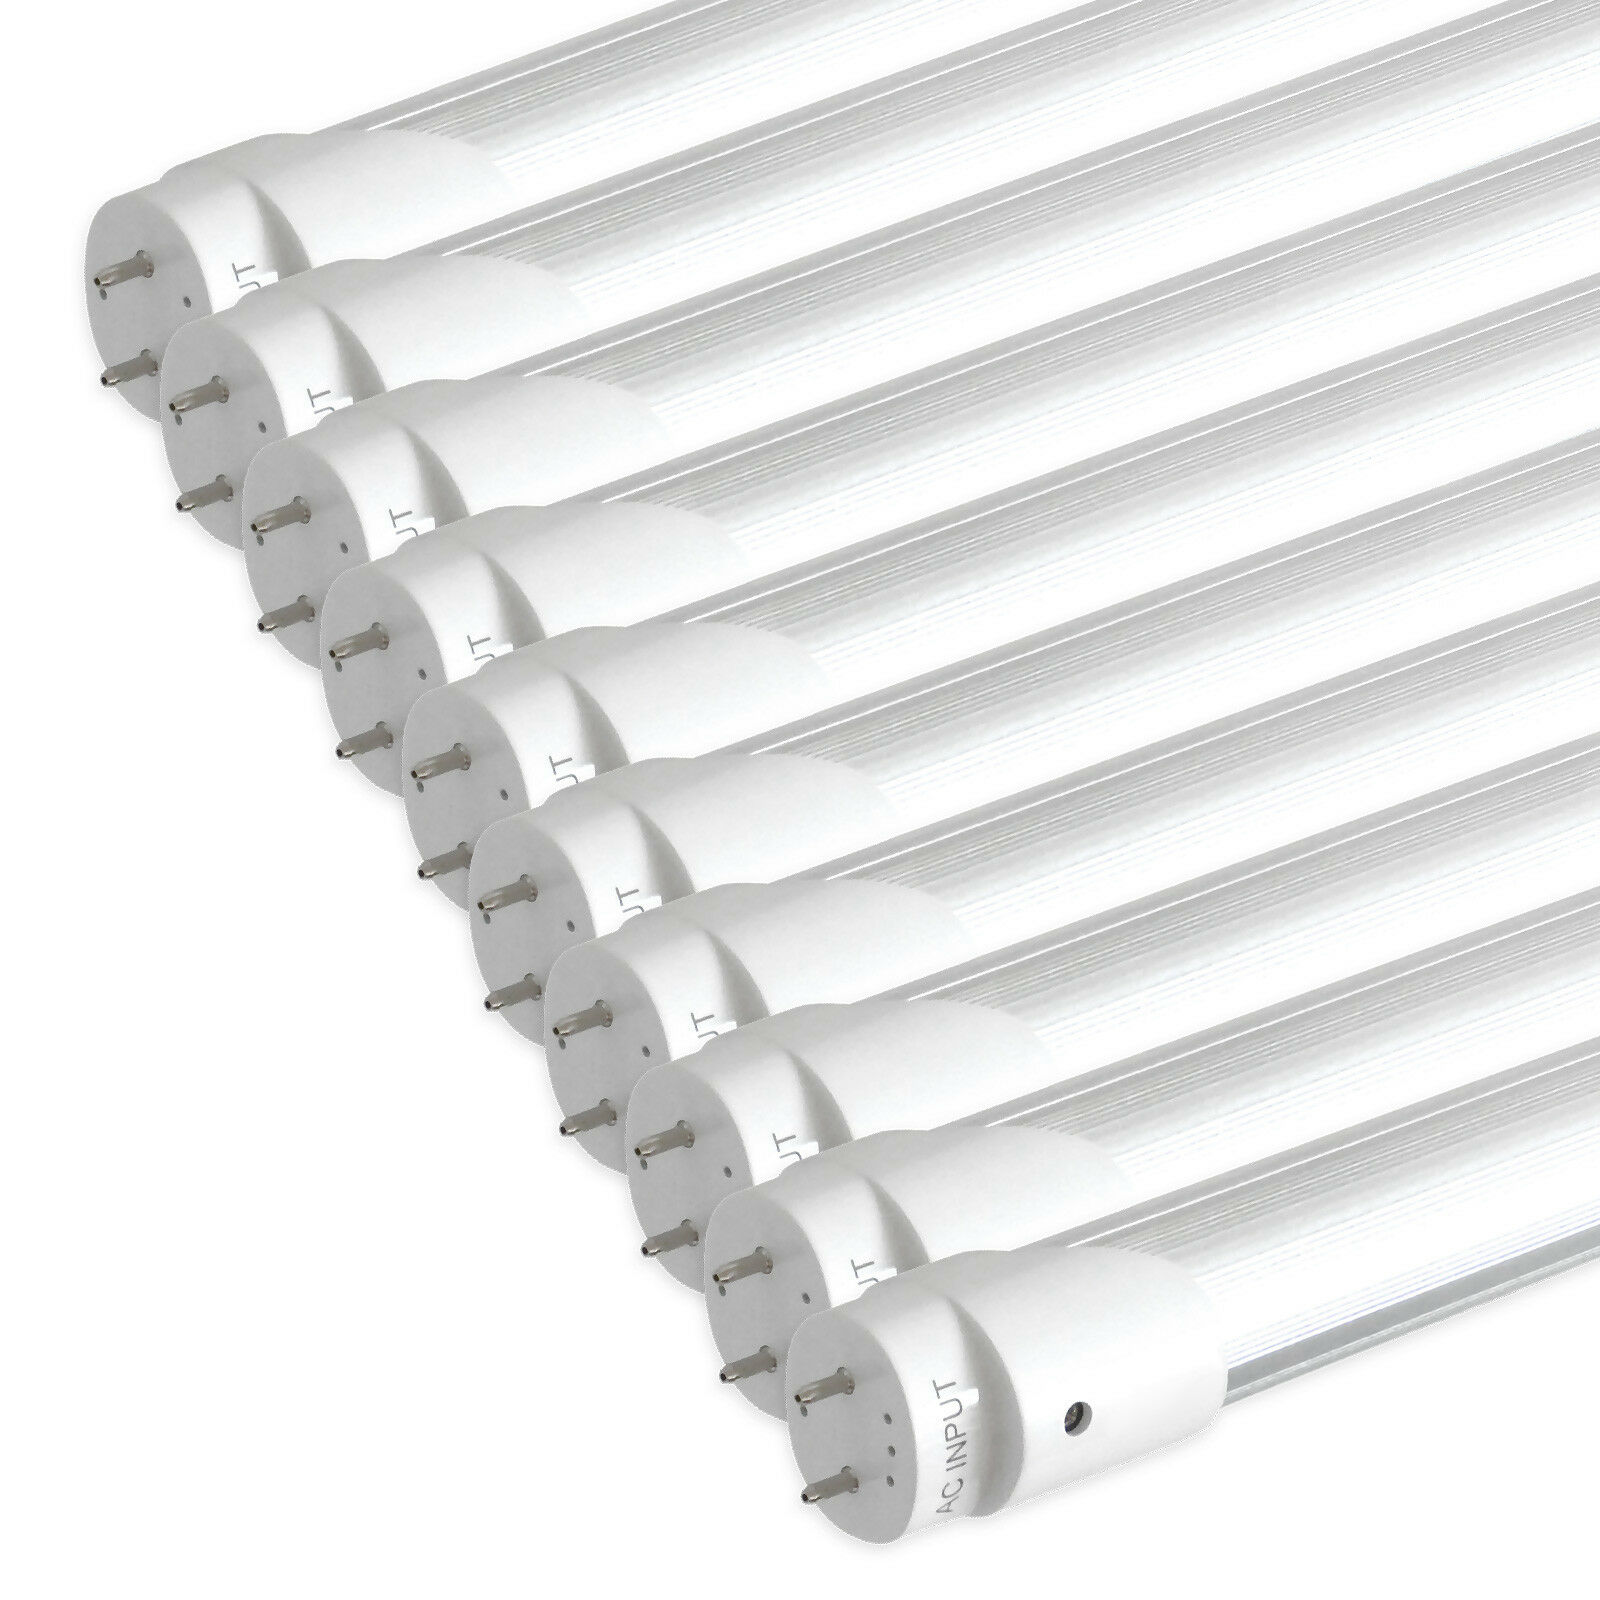 10x Xtend LED Leuchtstoffröhre 150cm Tageslichtweiß 6000K 29W T8 G13 LED Tube